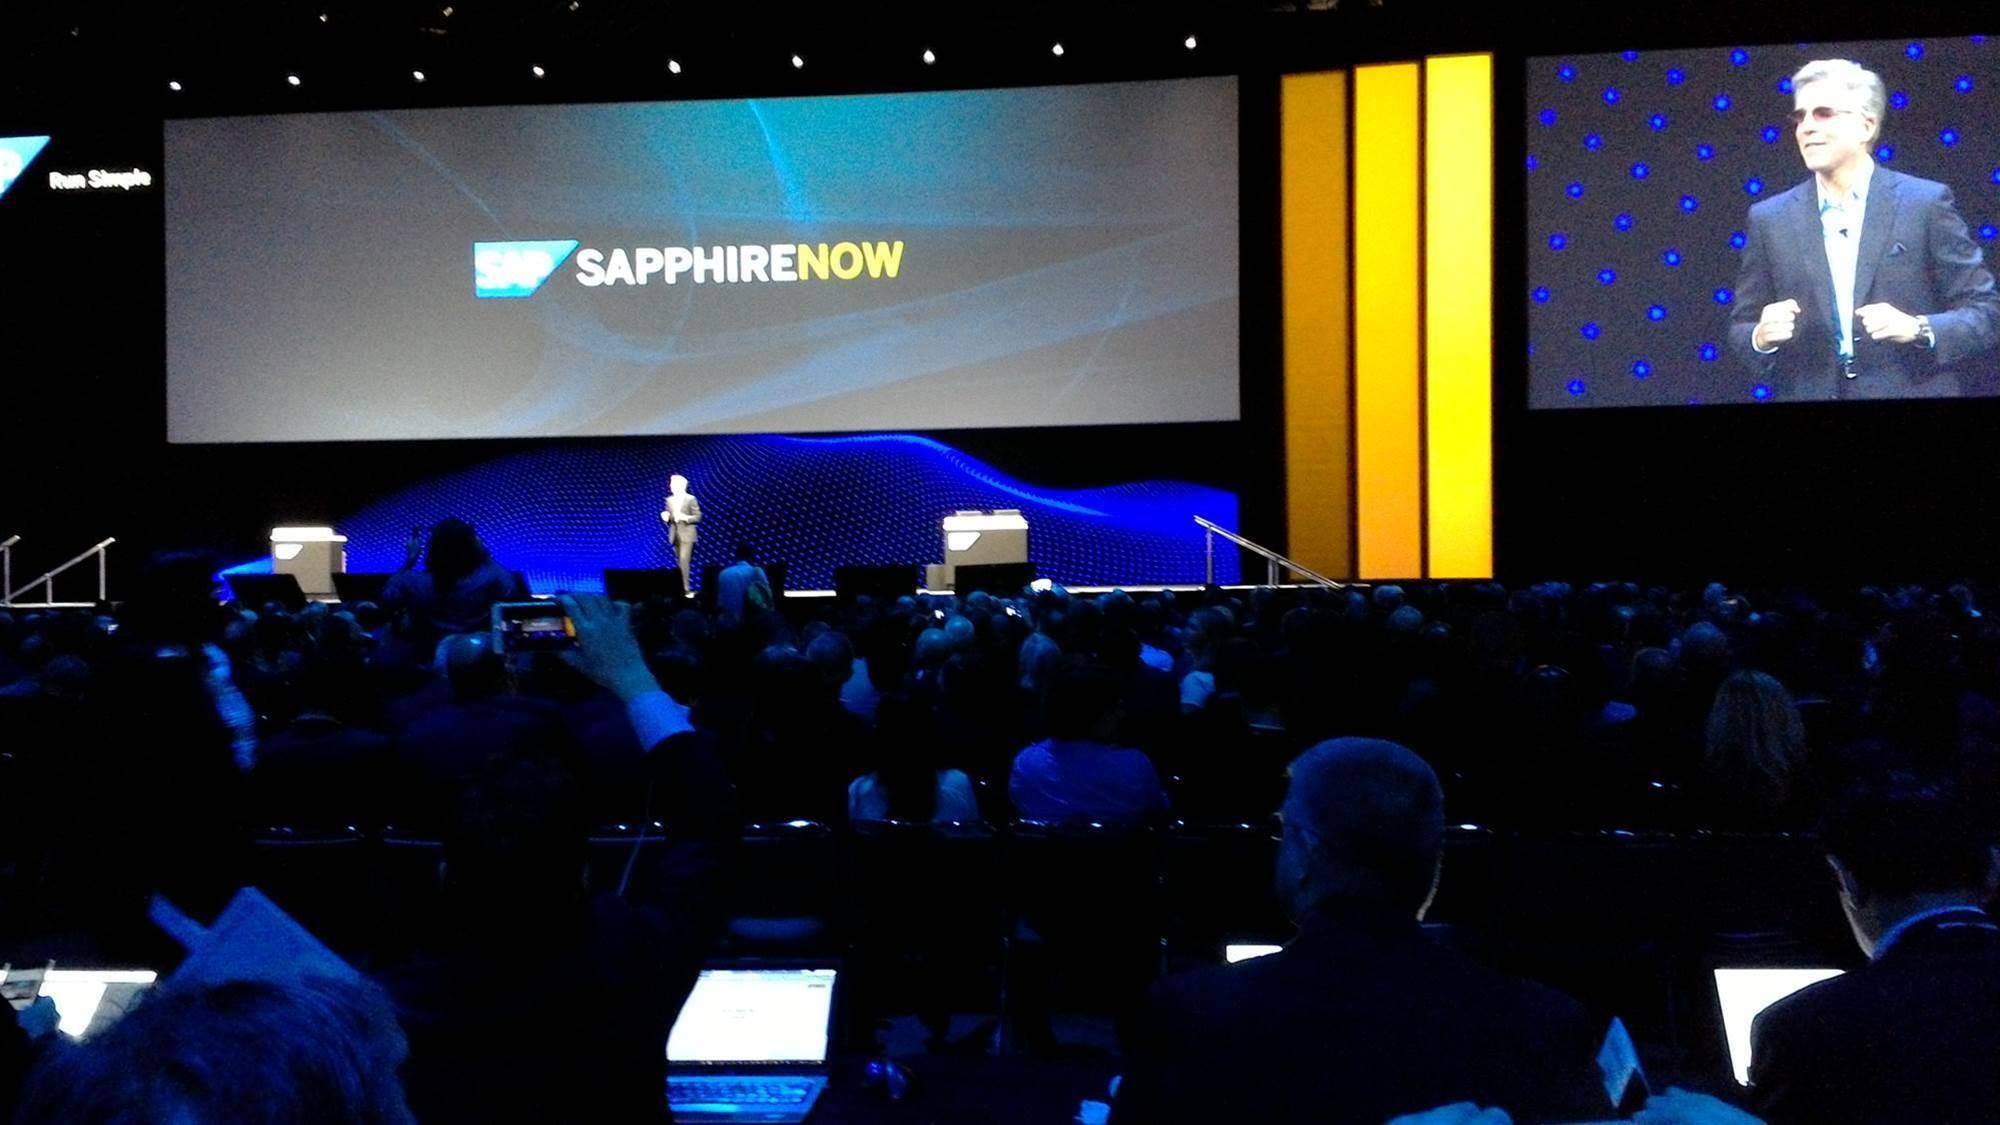 SAP backs its PaaS onto three public clouds